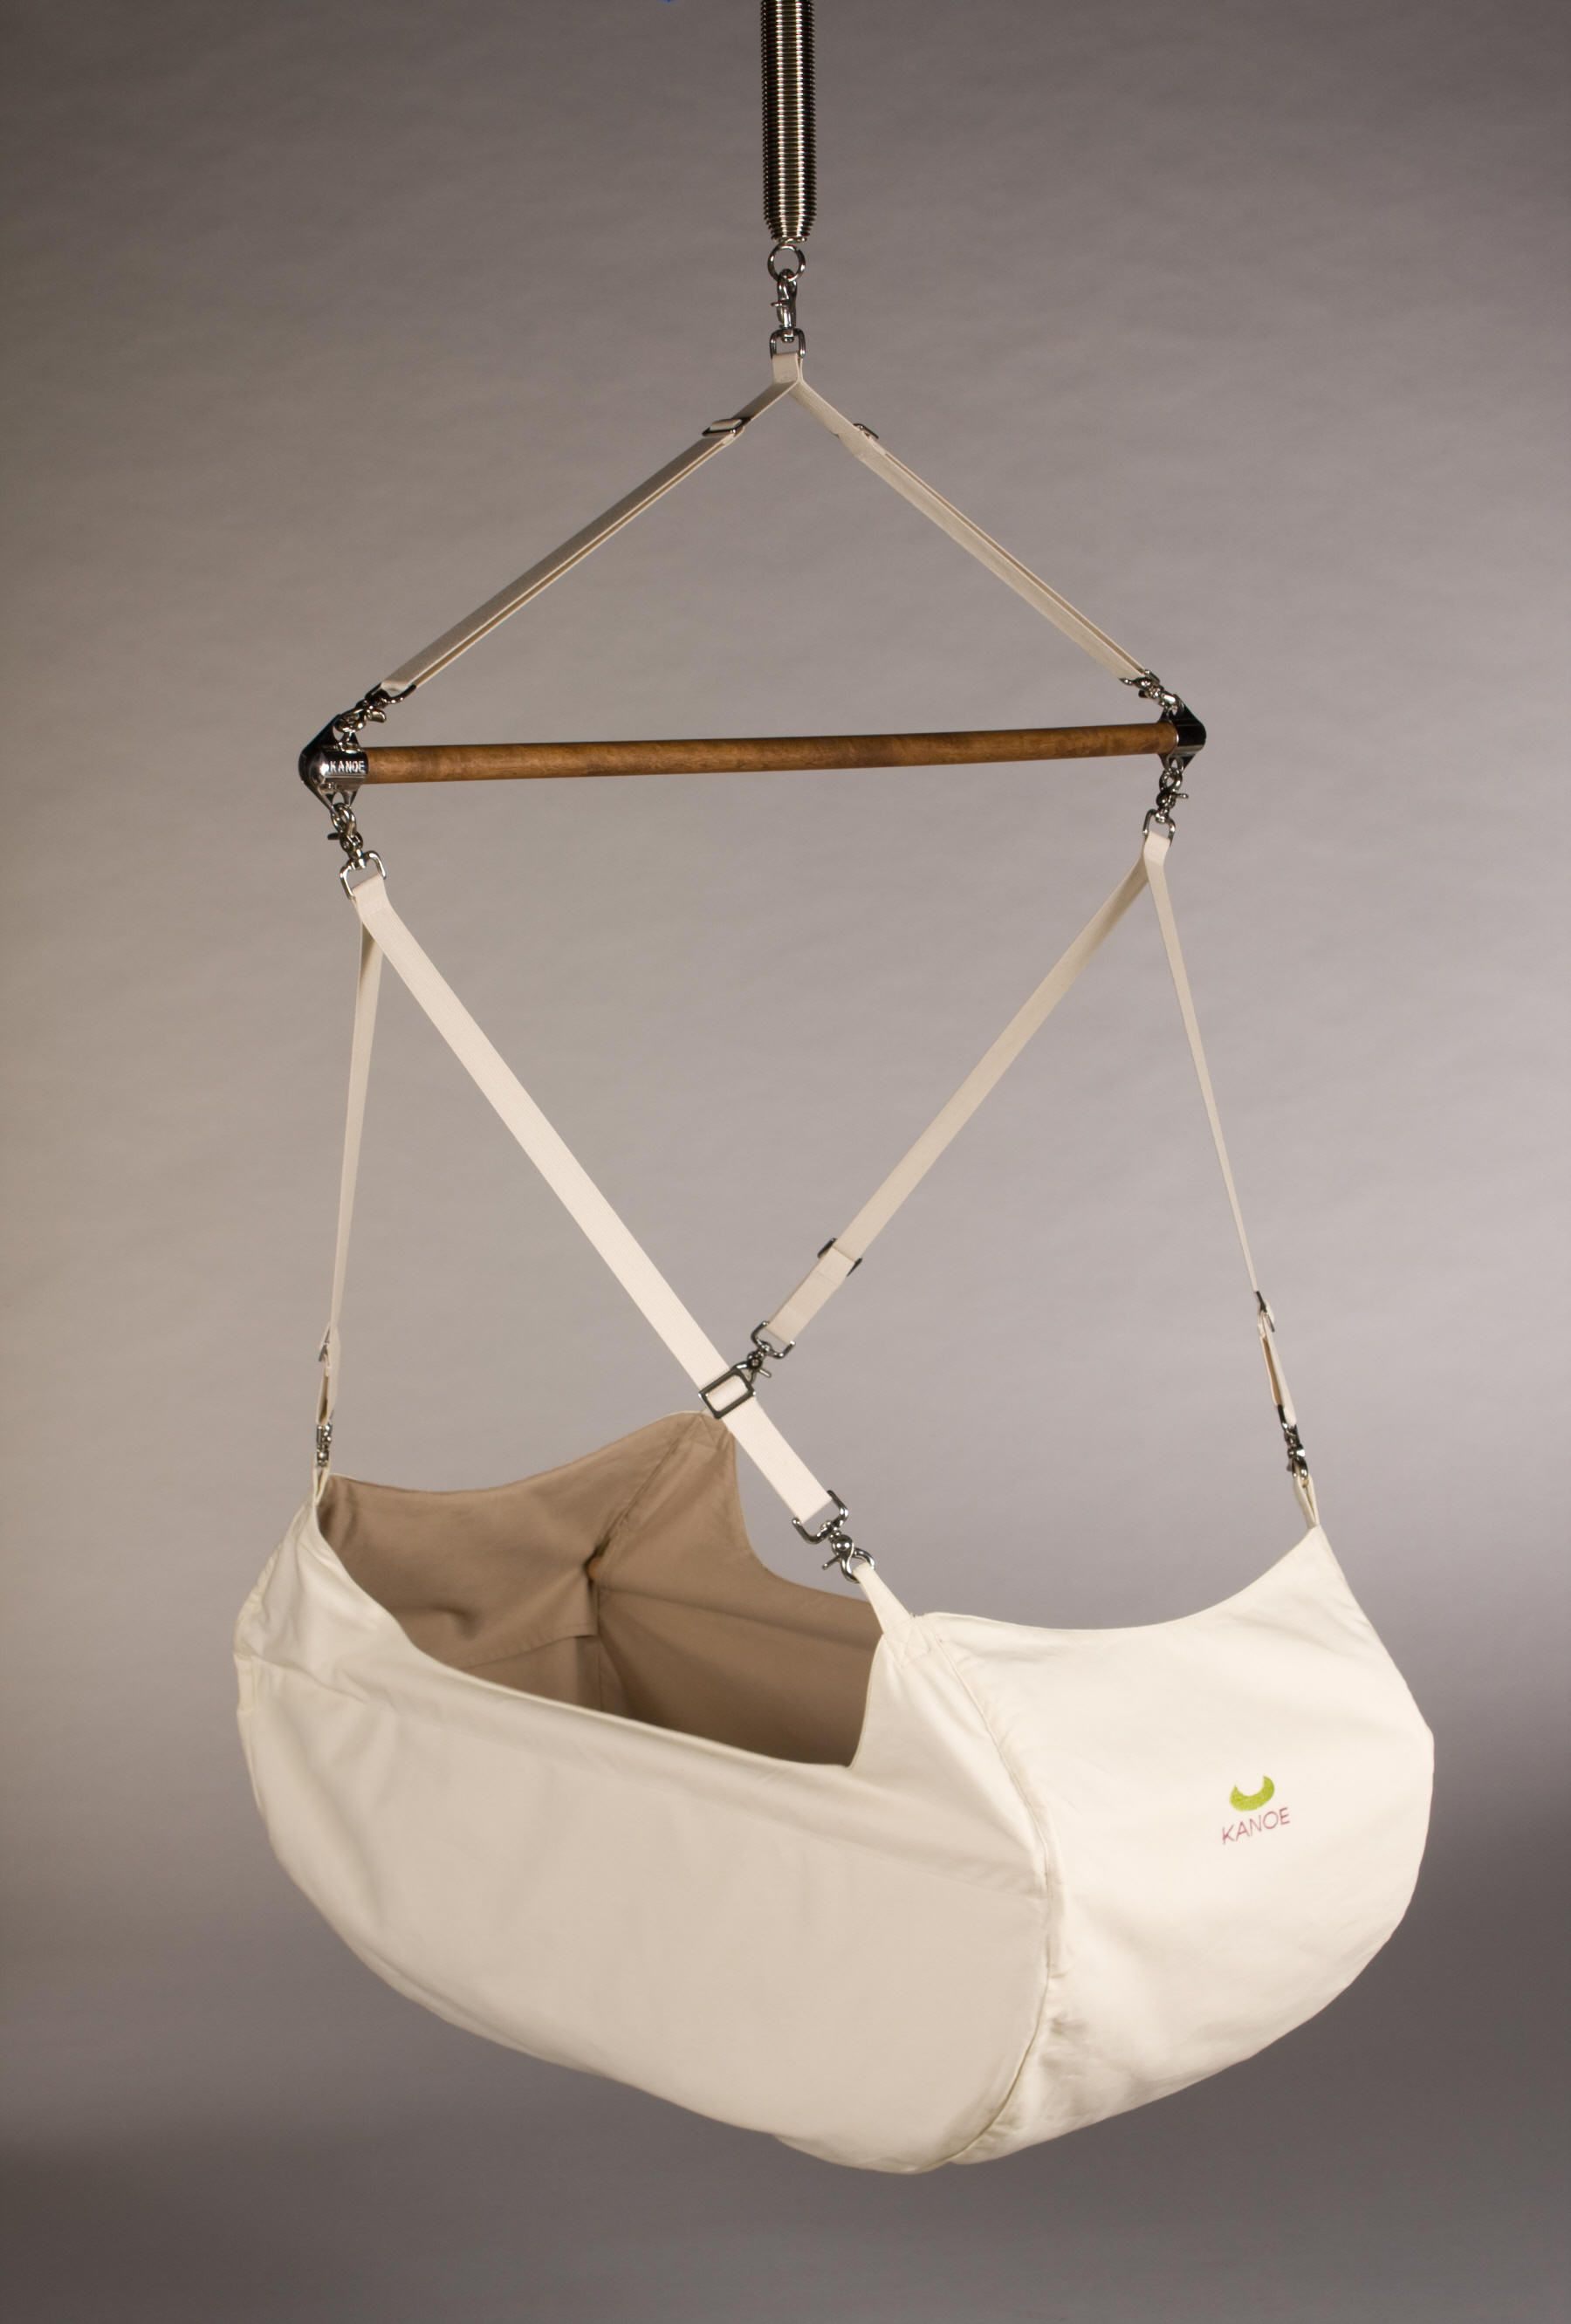 the kanoe motion sensitive baby hammocks are constructed from the who needs a crib   the kanoe motion sensitive baby hammocks are      rh   pinterest co uk